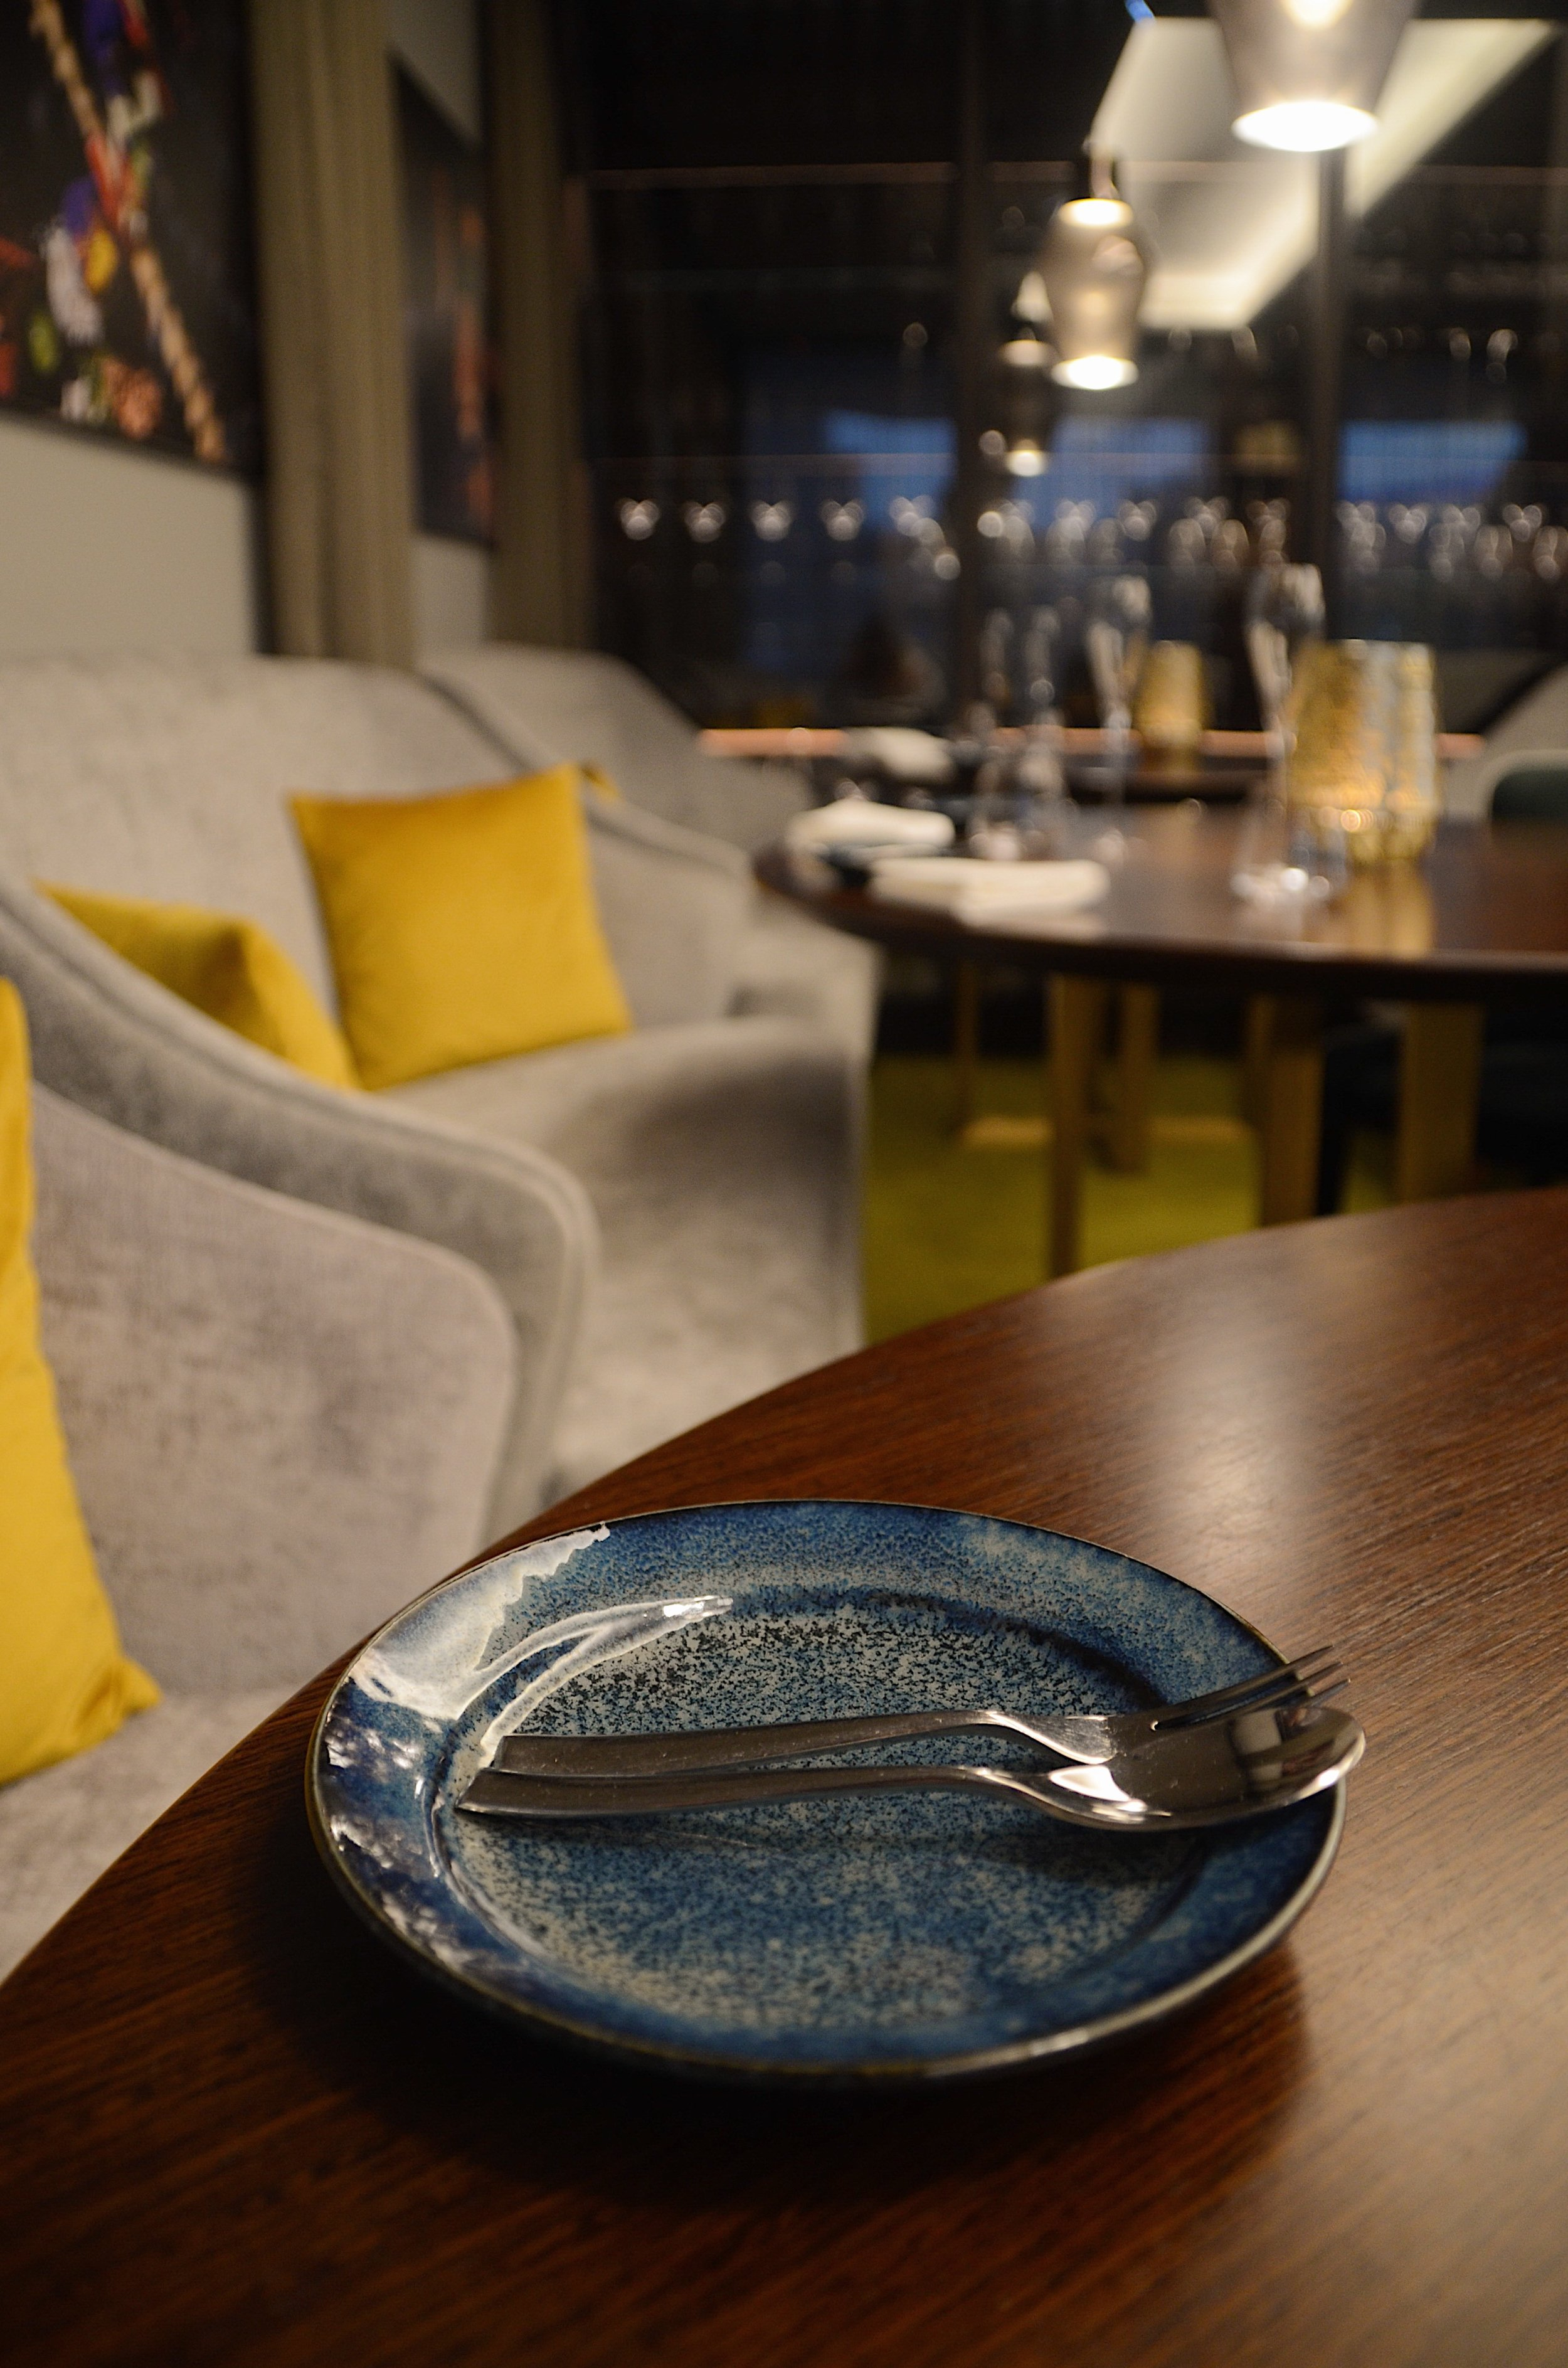 casual seating and beautiful glazed crockery